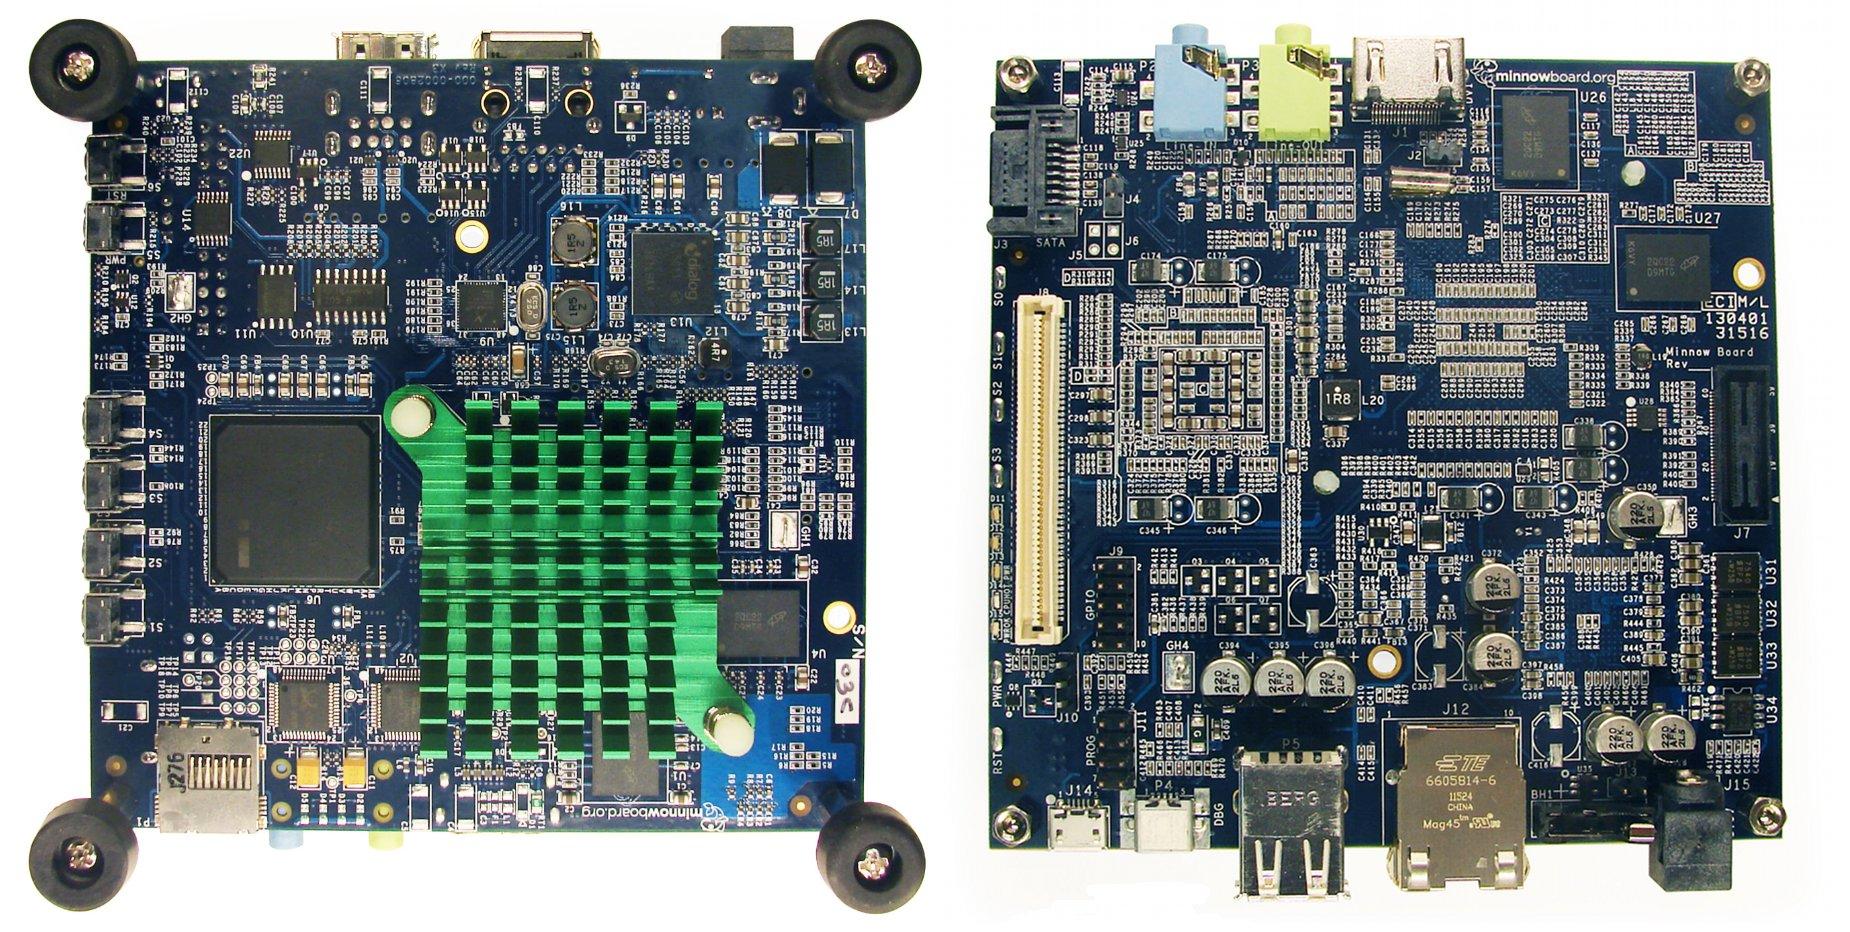 INTEL to release Open Source Hardware board based on Atom